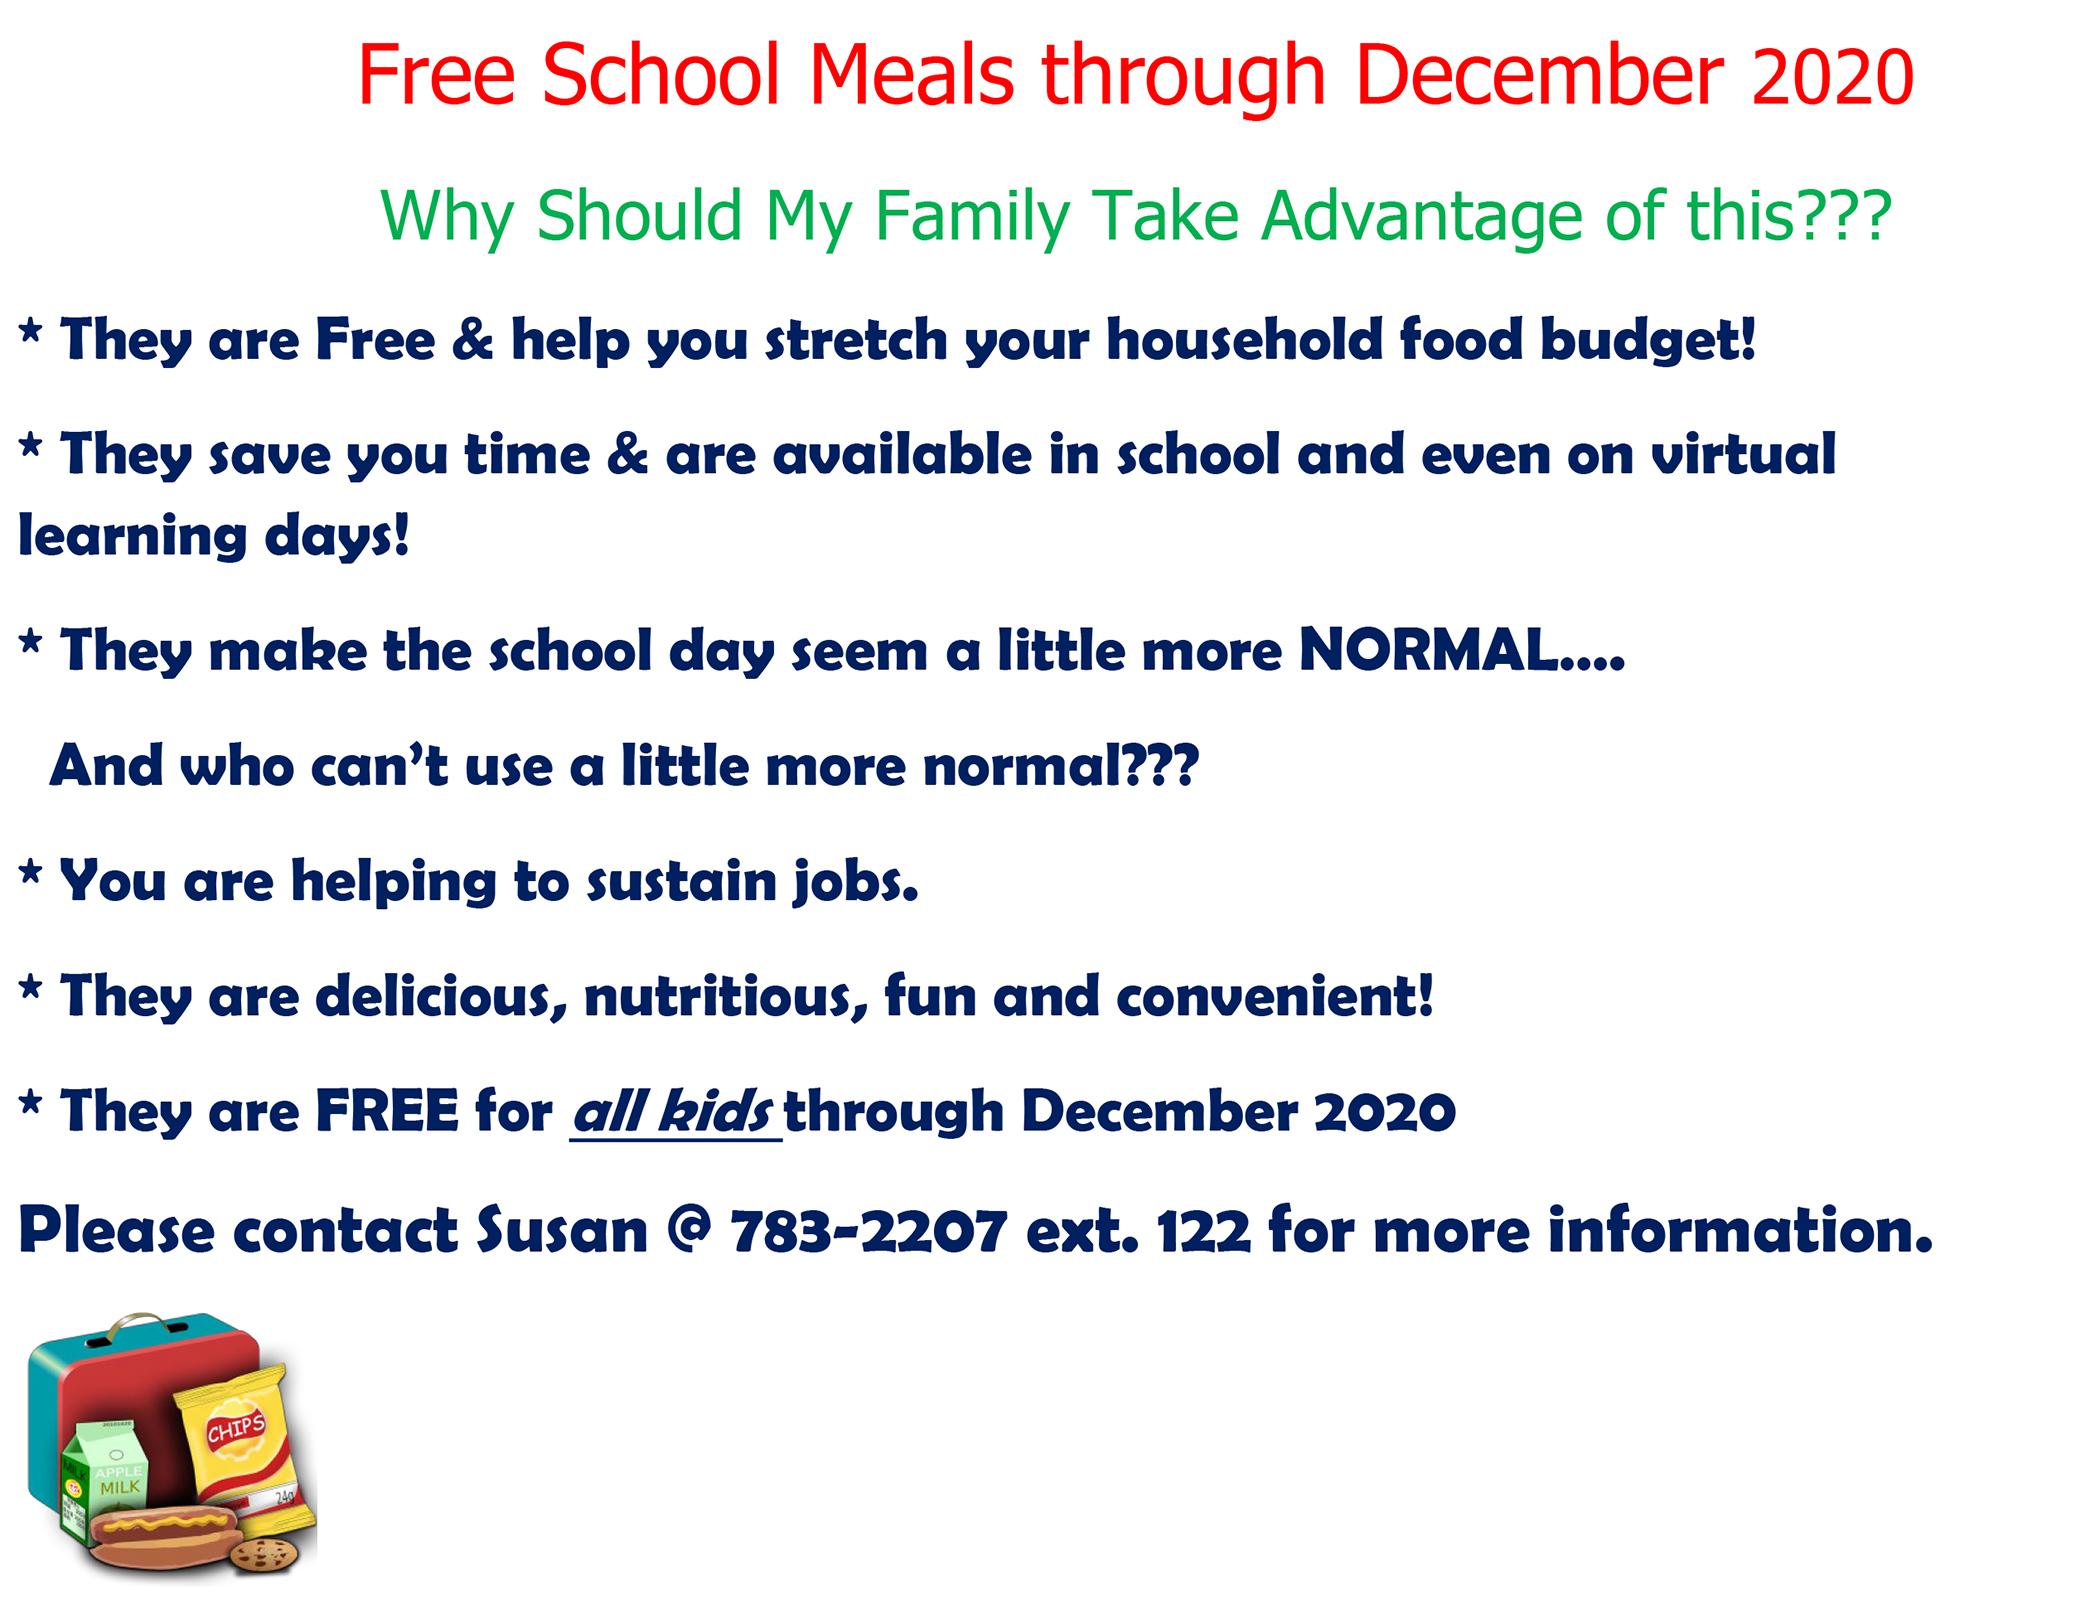 Free School Meals Through December 2020 Flyer